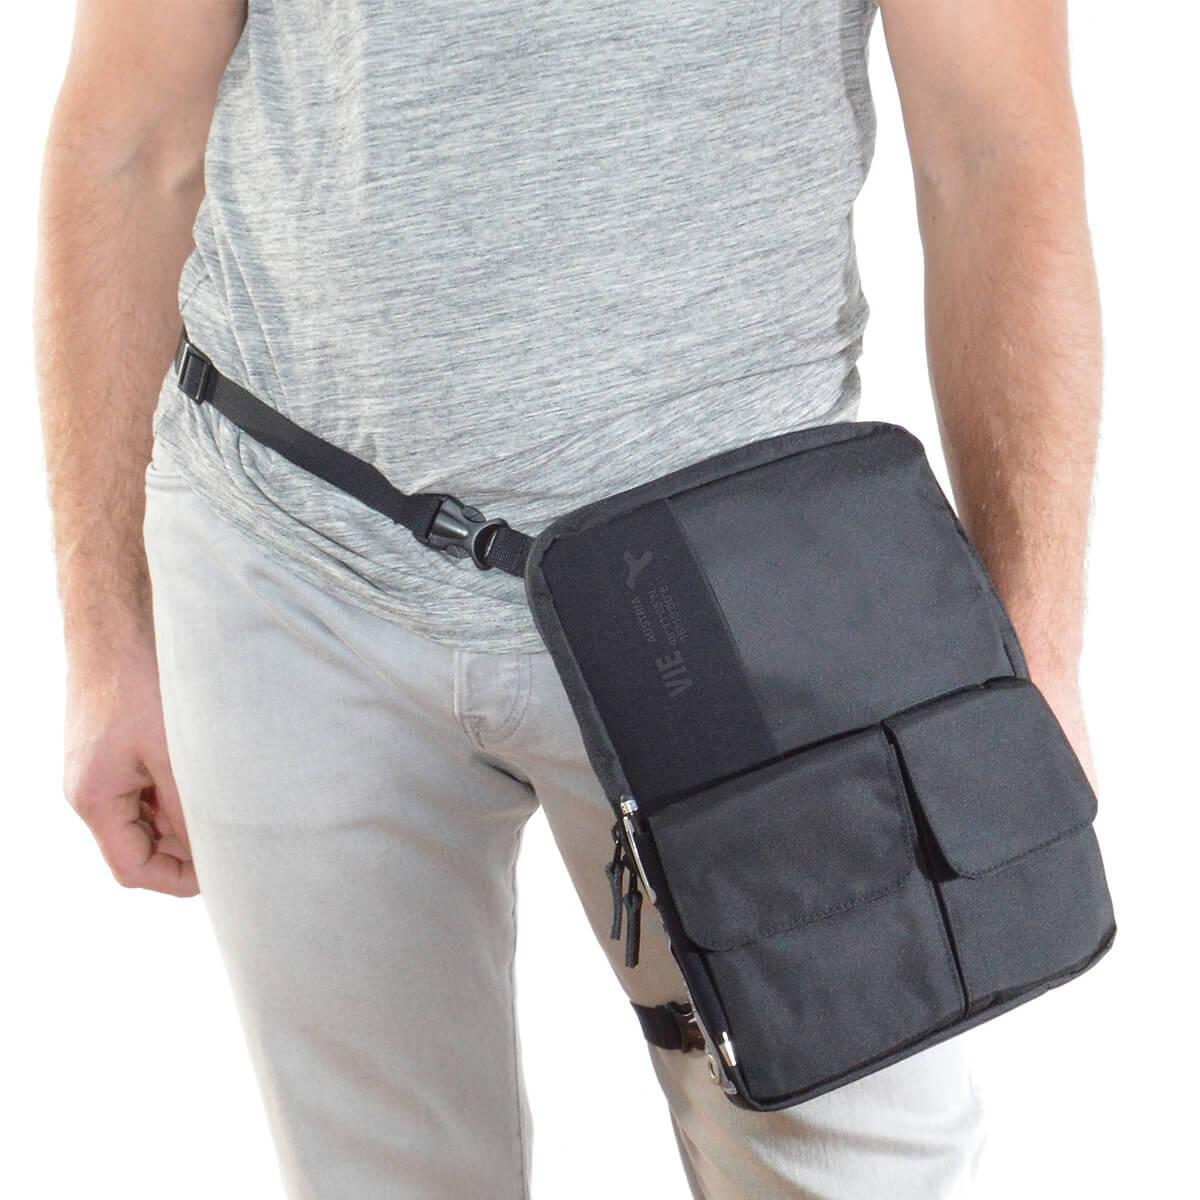 flexible multifunctional tablet bag as waistbag